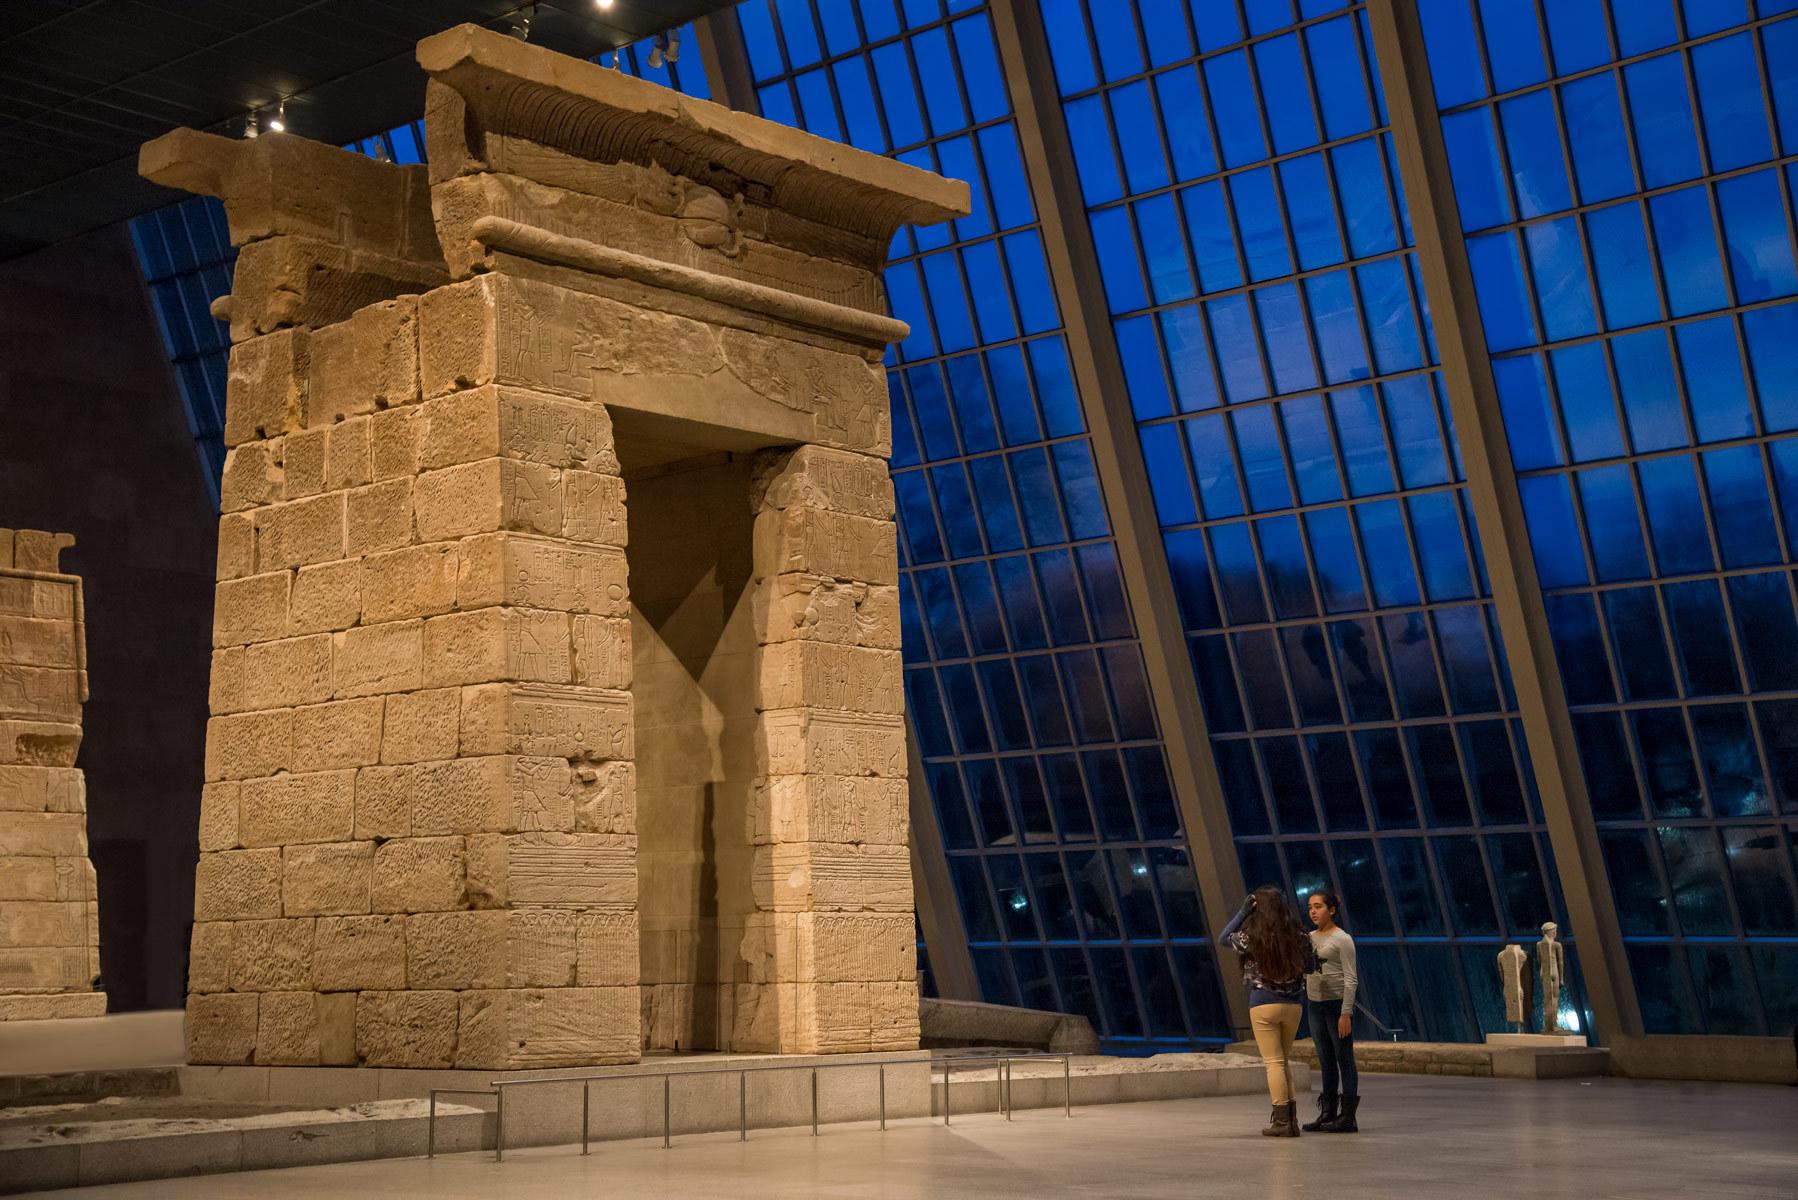 Metropolitan Museum of Art - New York, NY